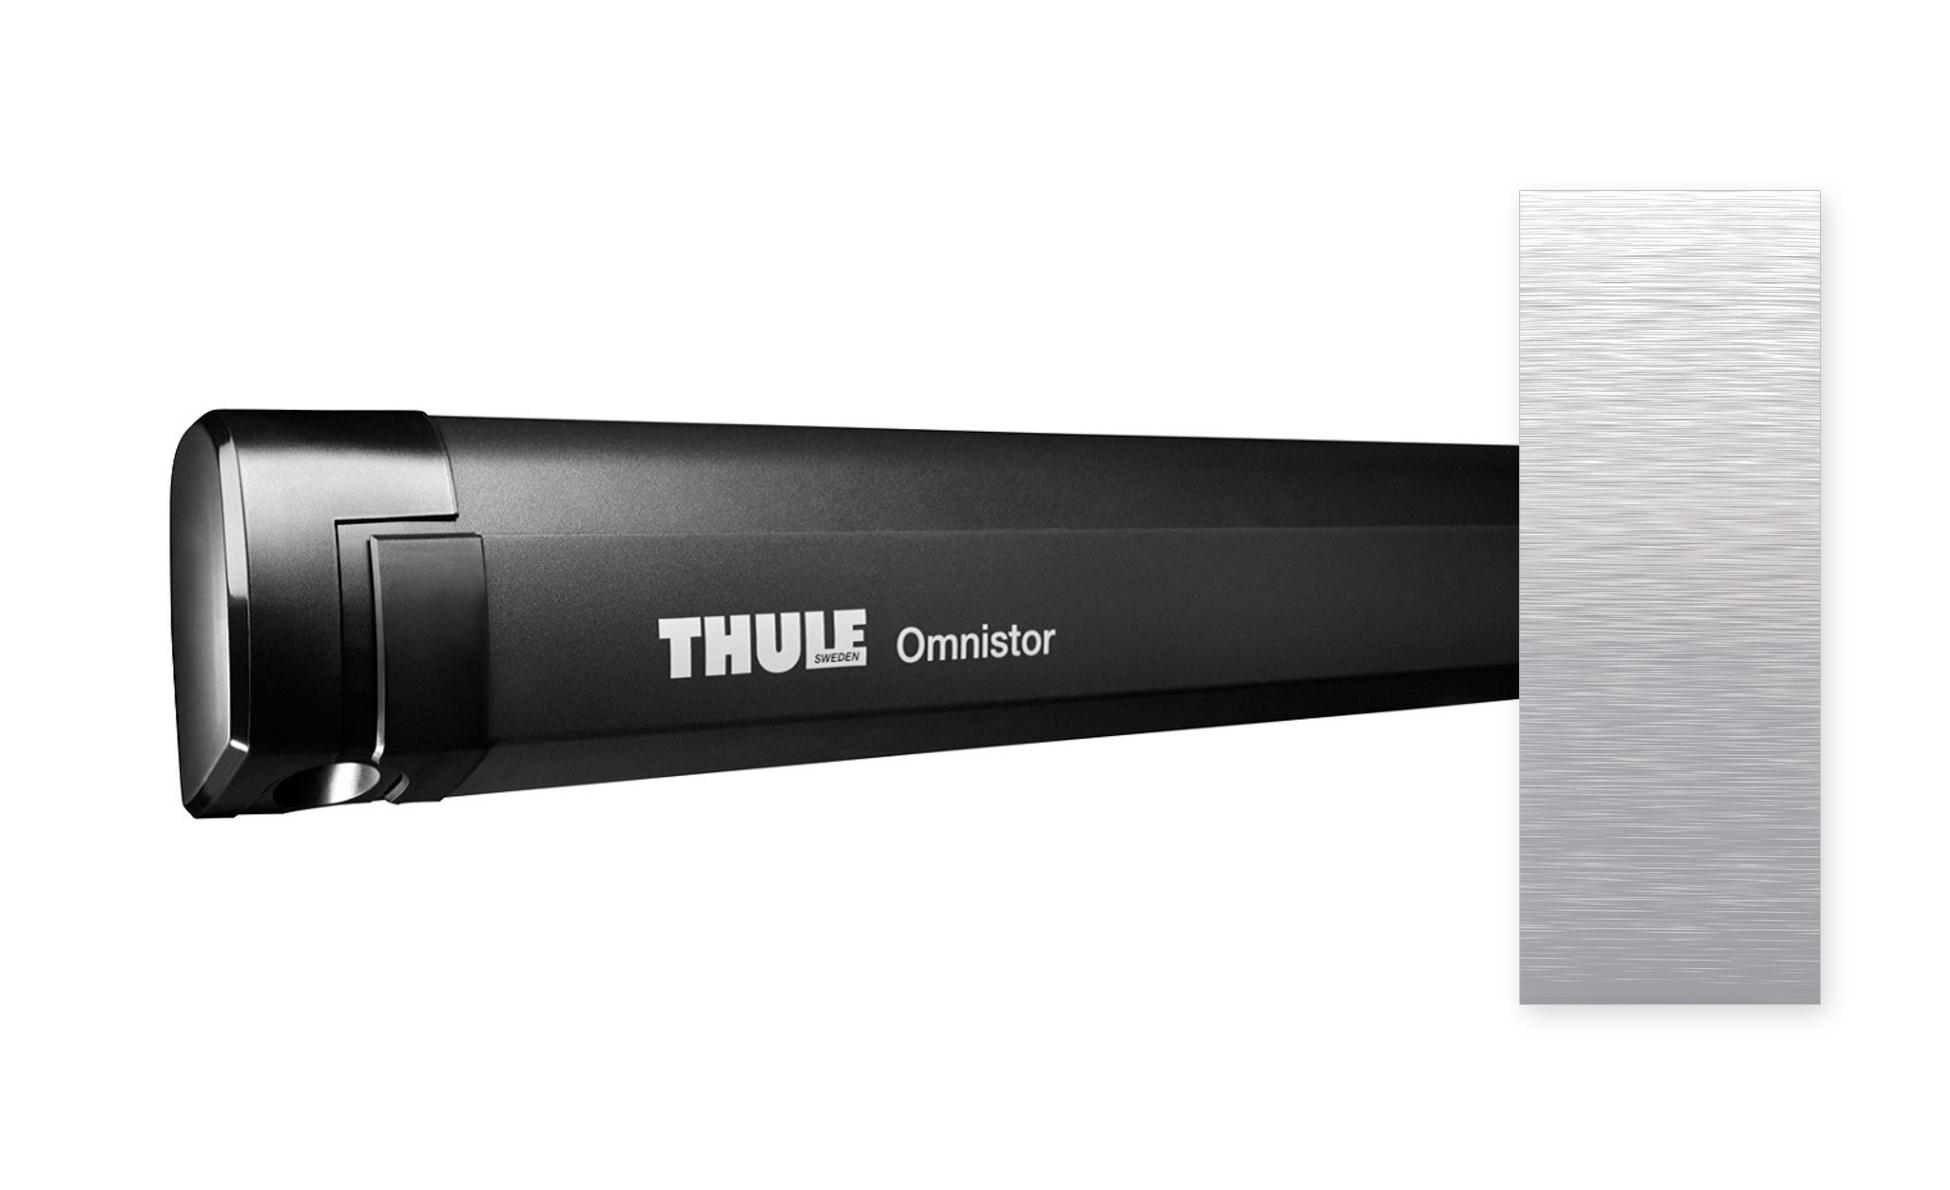 Thule Omnistor 5200 anthrazit 375x250 cm, Mystic Grau